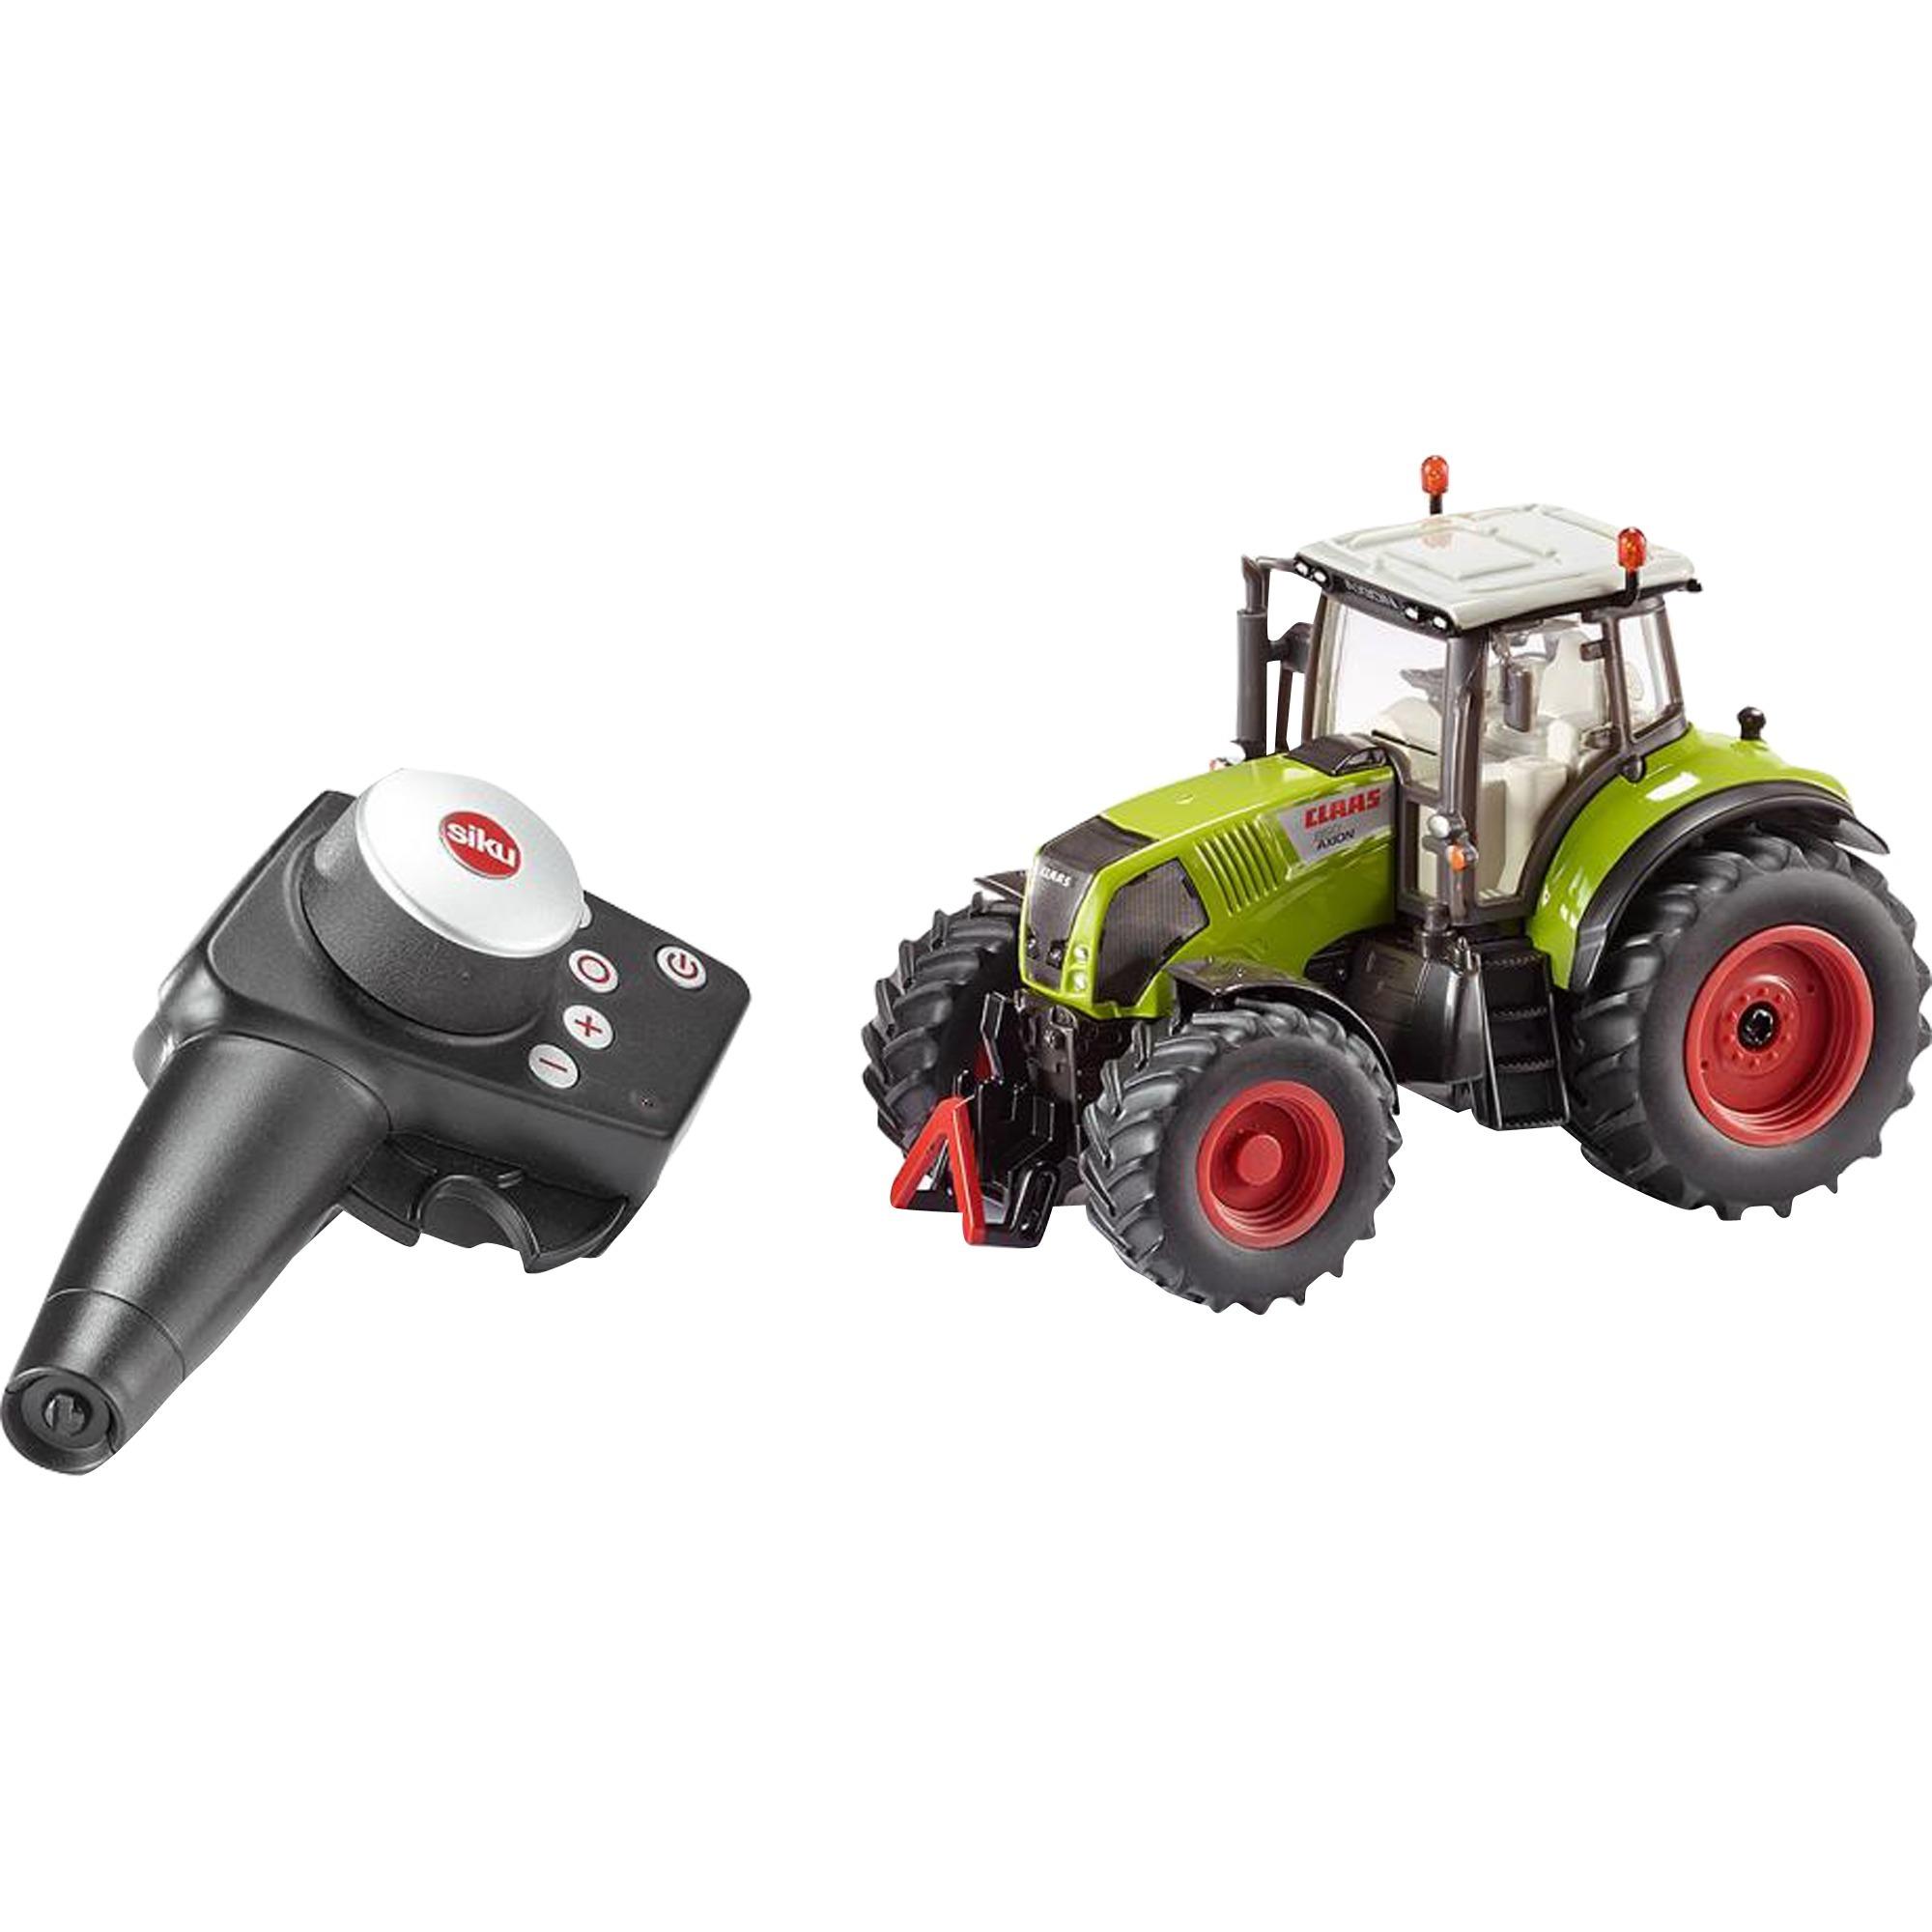 Radio Commande - Camion - Coffret Tracteur Claas Axion 850 Avec Télécommande Infrarouge, RC